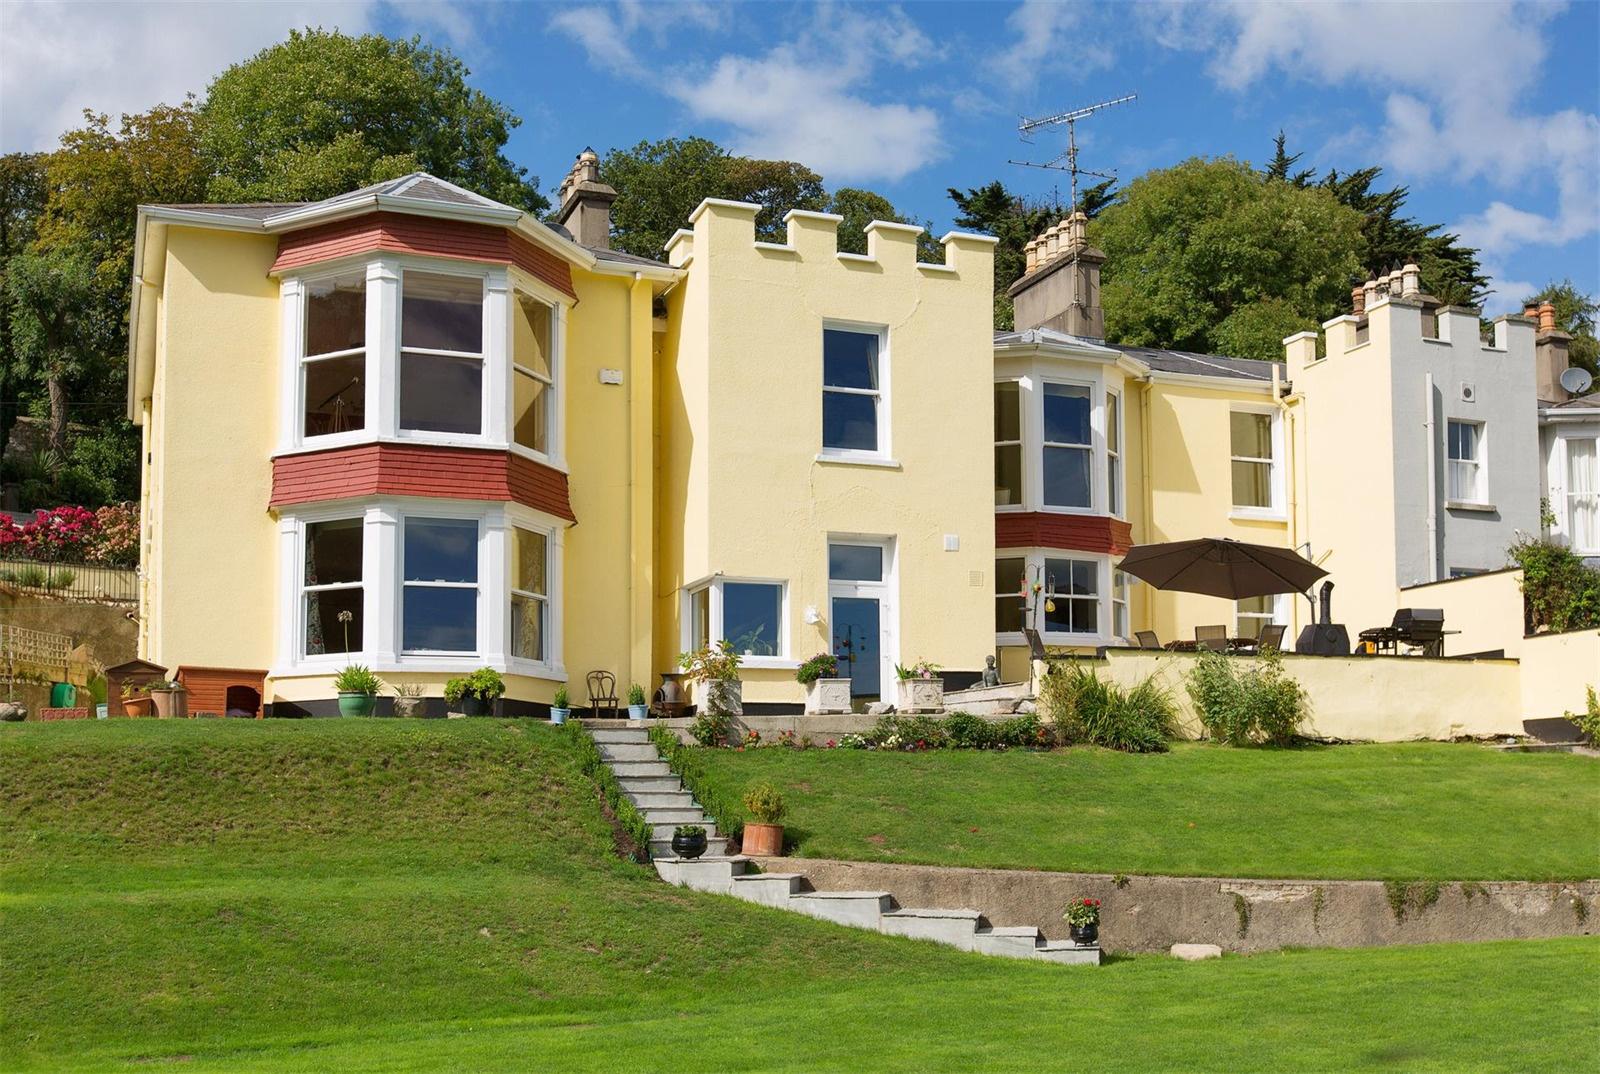 Overlooking Killiney Bay, Saintbury House was the childhood home of silver screen legend Maureen O'Sullivan.